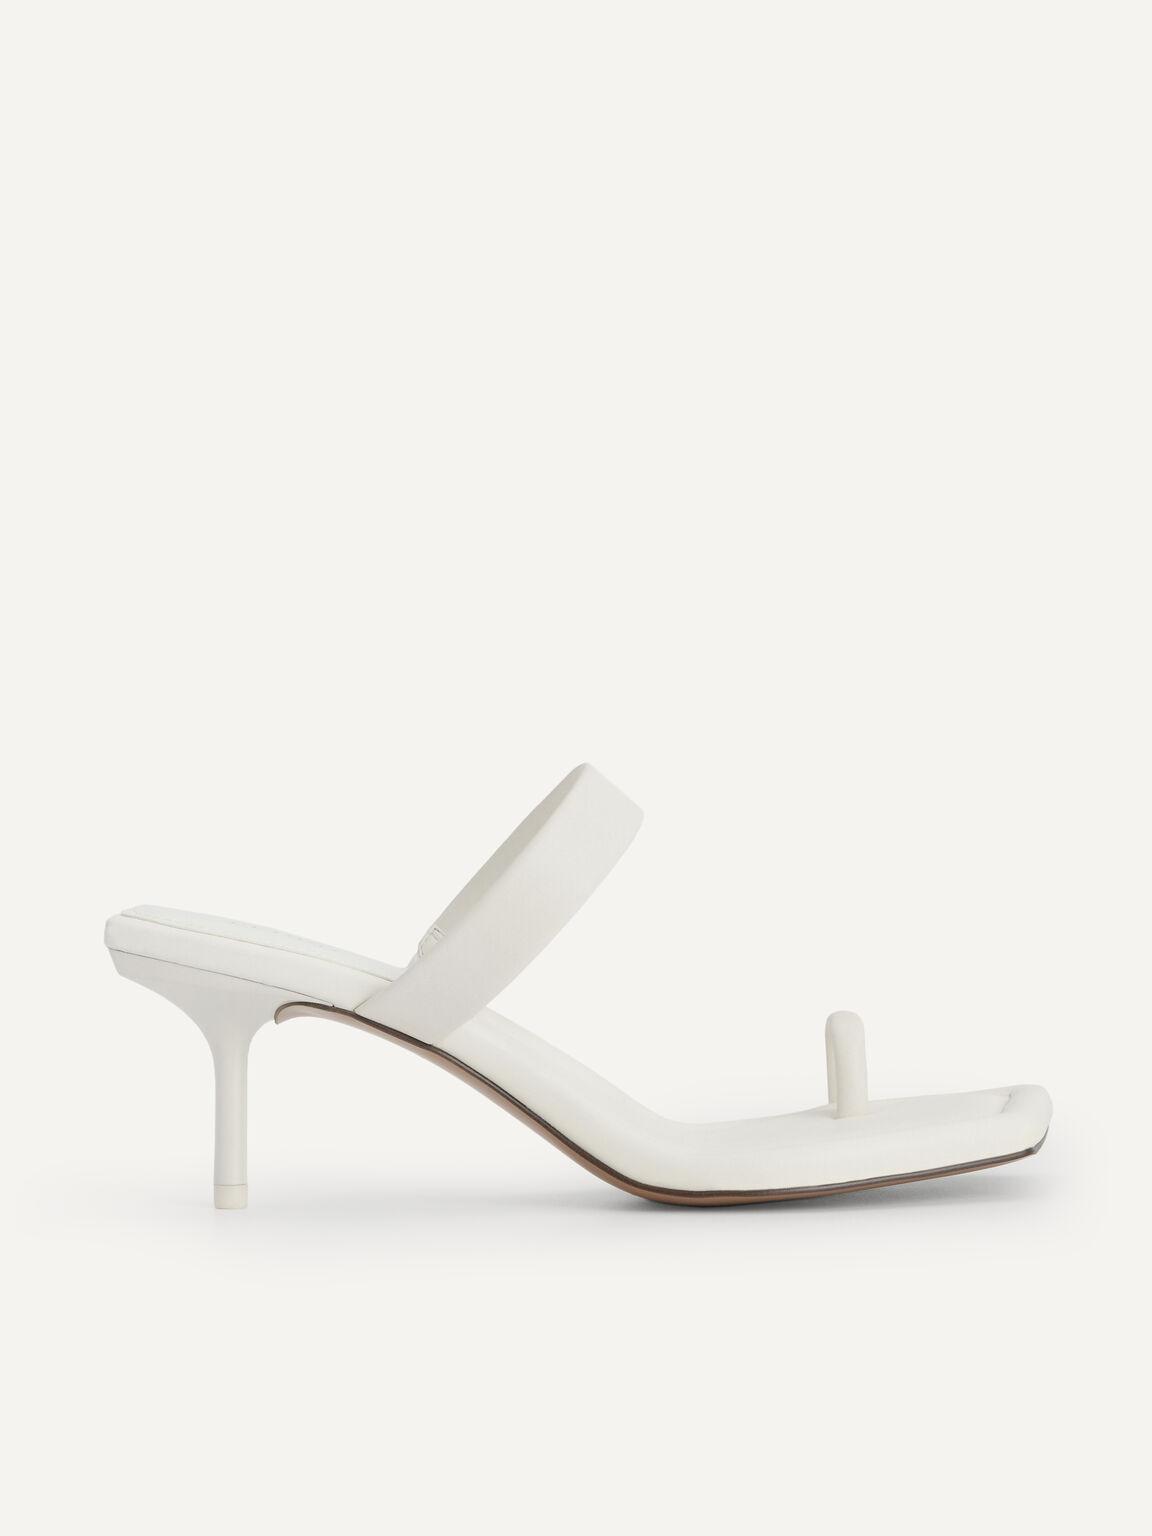 Strappy Toe Loop Heeled Sandals, Chalk, hi-res